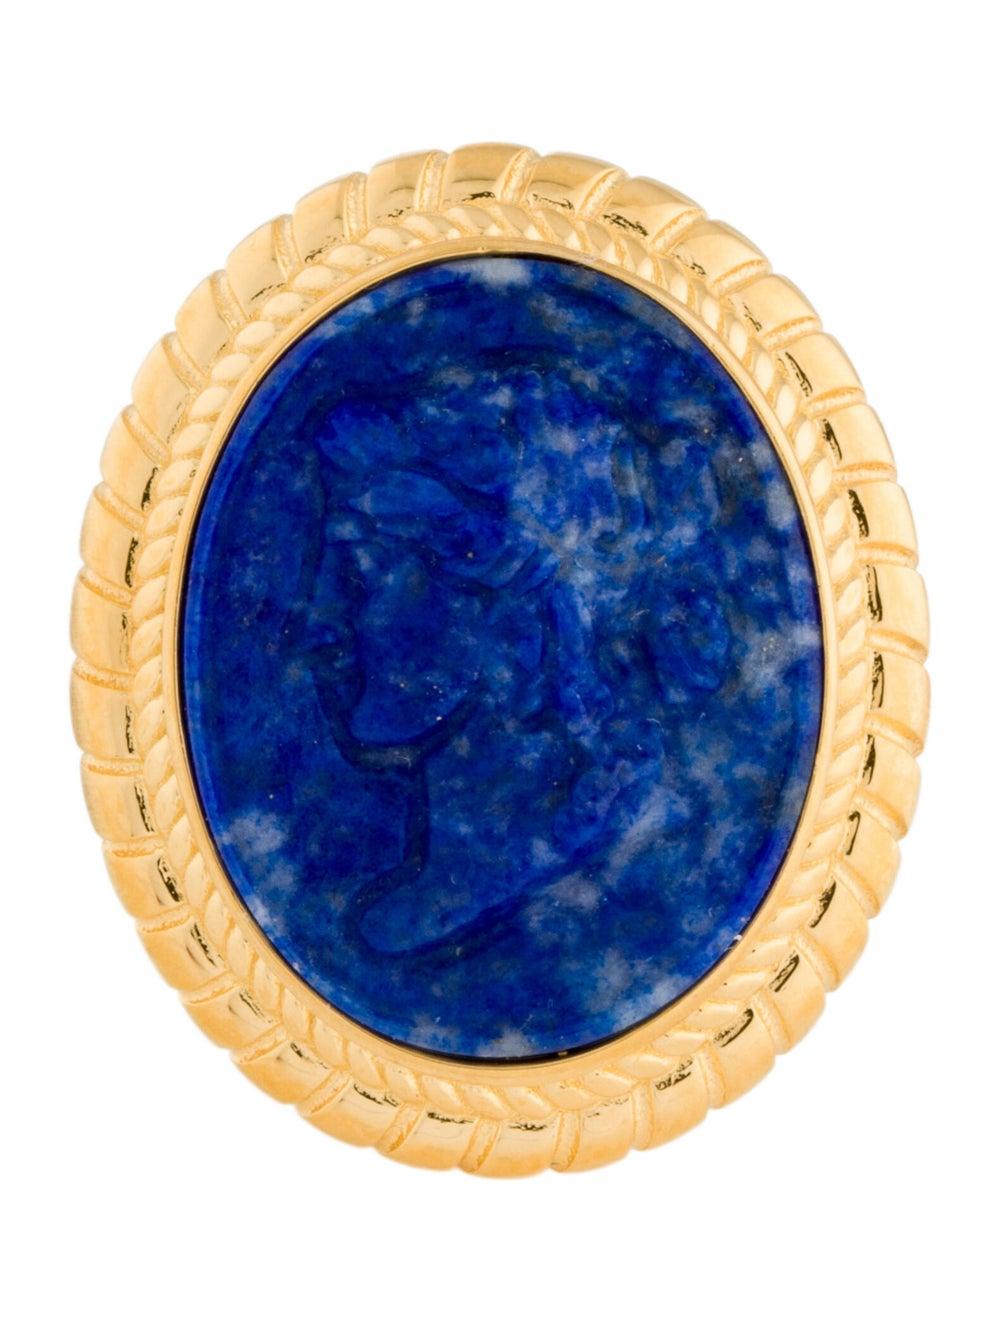 Tagliamonte Lapis Lazuli Cameo Cocktail Ring Gold - image 3